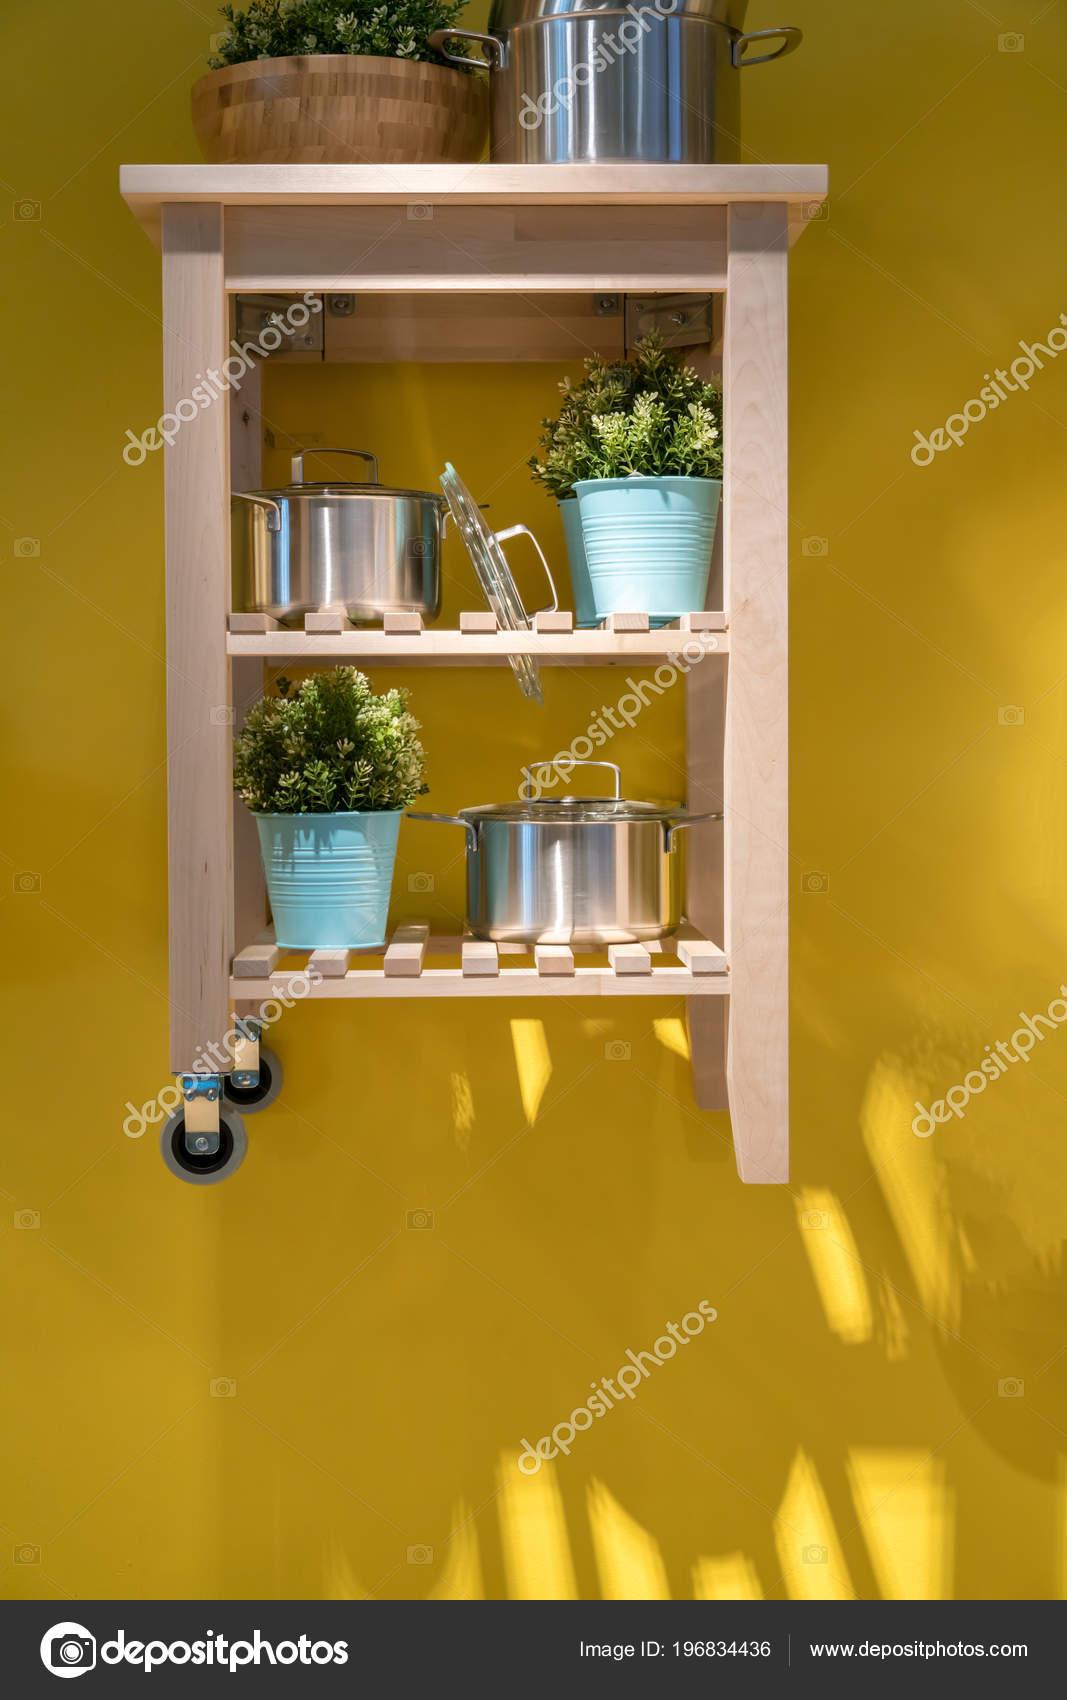 kitchen carts cheap hotels with kitchens 木岛厨房推车为家庭设计和装饰反对黄色墙壁 图库照片 c v74 196834436